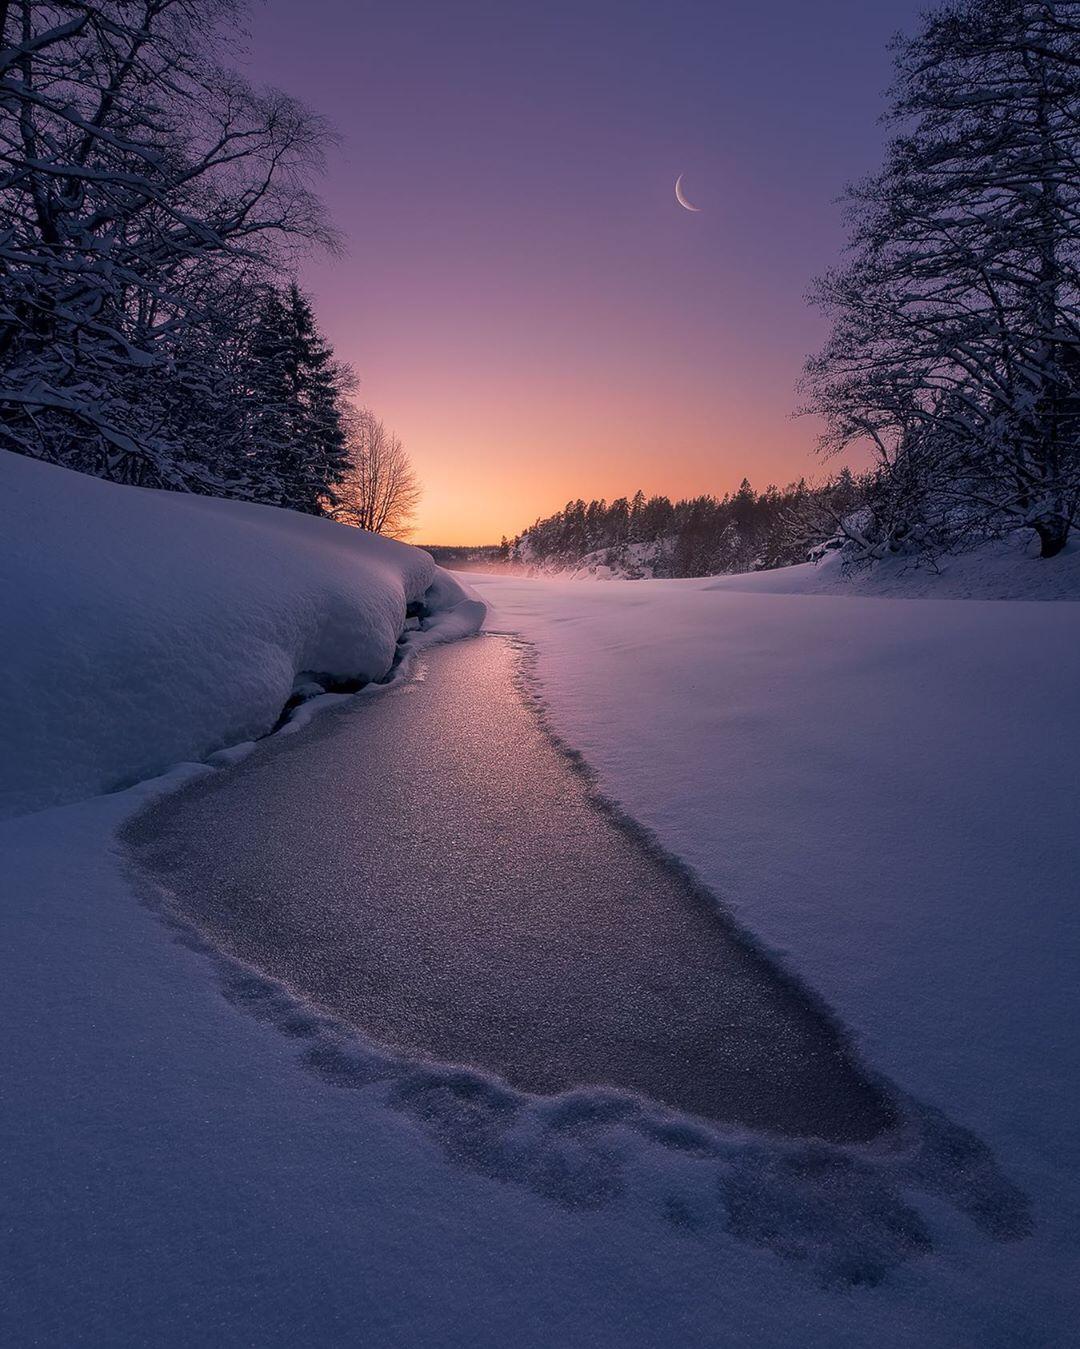 Сказочные пейзажи Норвегии от Ханса Гуннара Аслаксена